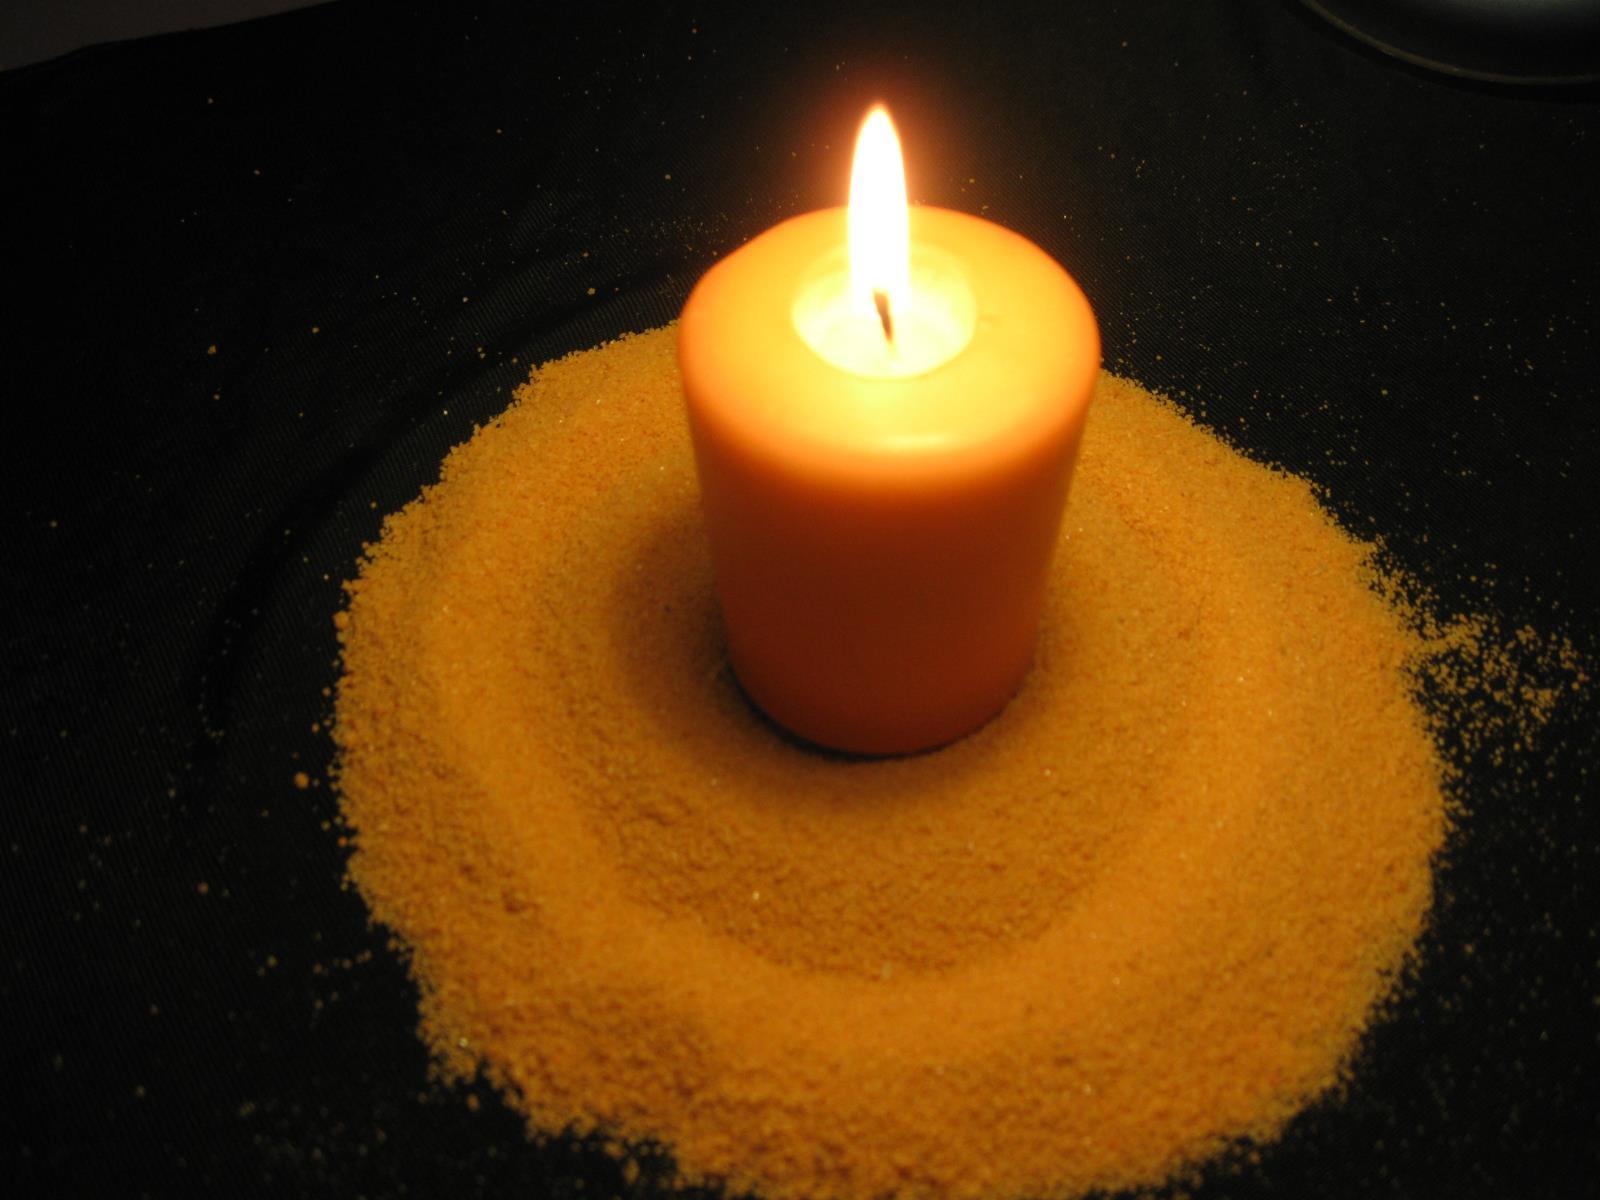 Encender velas como se usan las velas en la magia velas magicas rituales con velas cosas de - Velas de la suerte ...